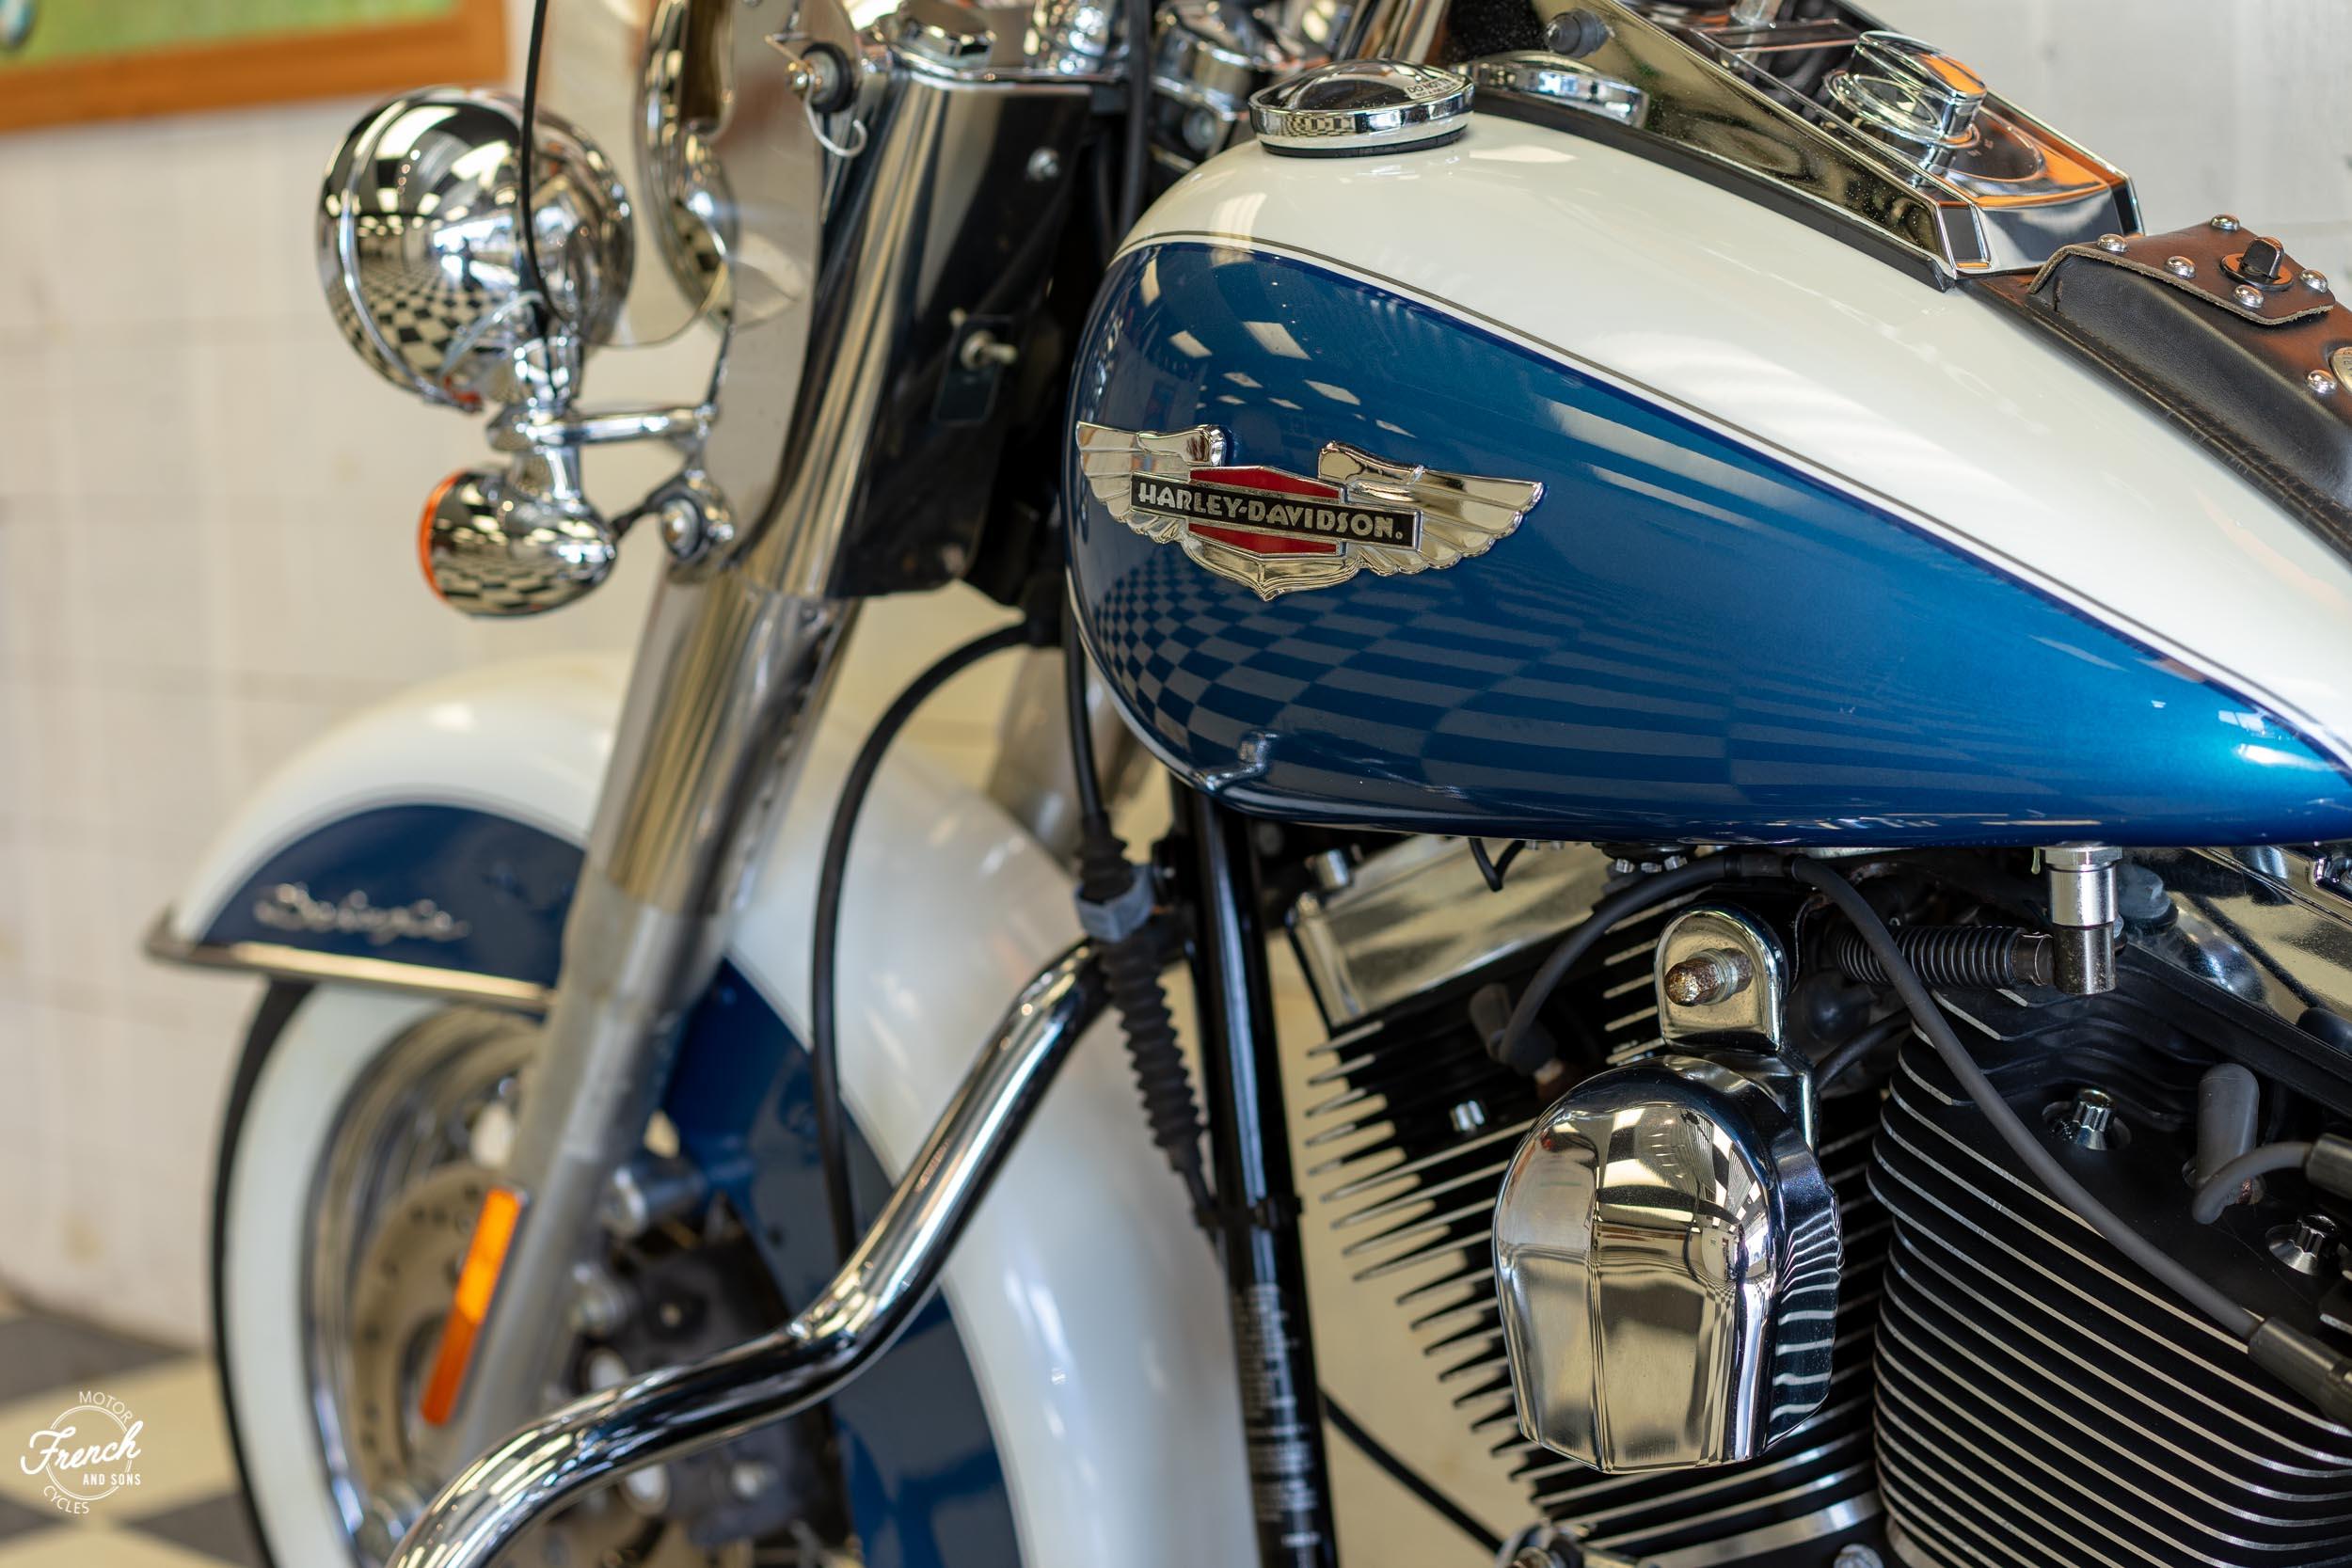 2005_Harley_Davidson_Softail_Deluxe-23.jpg